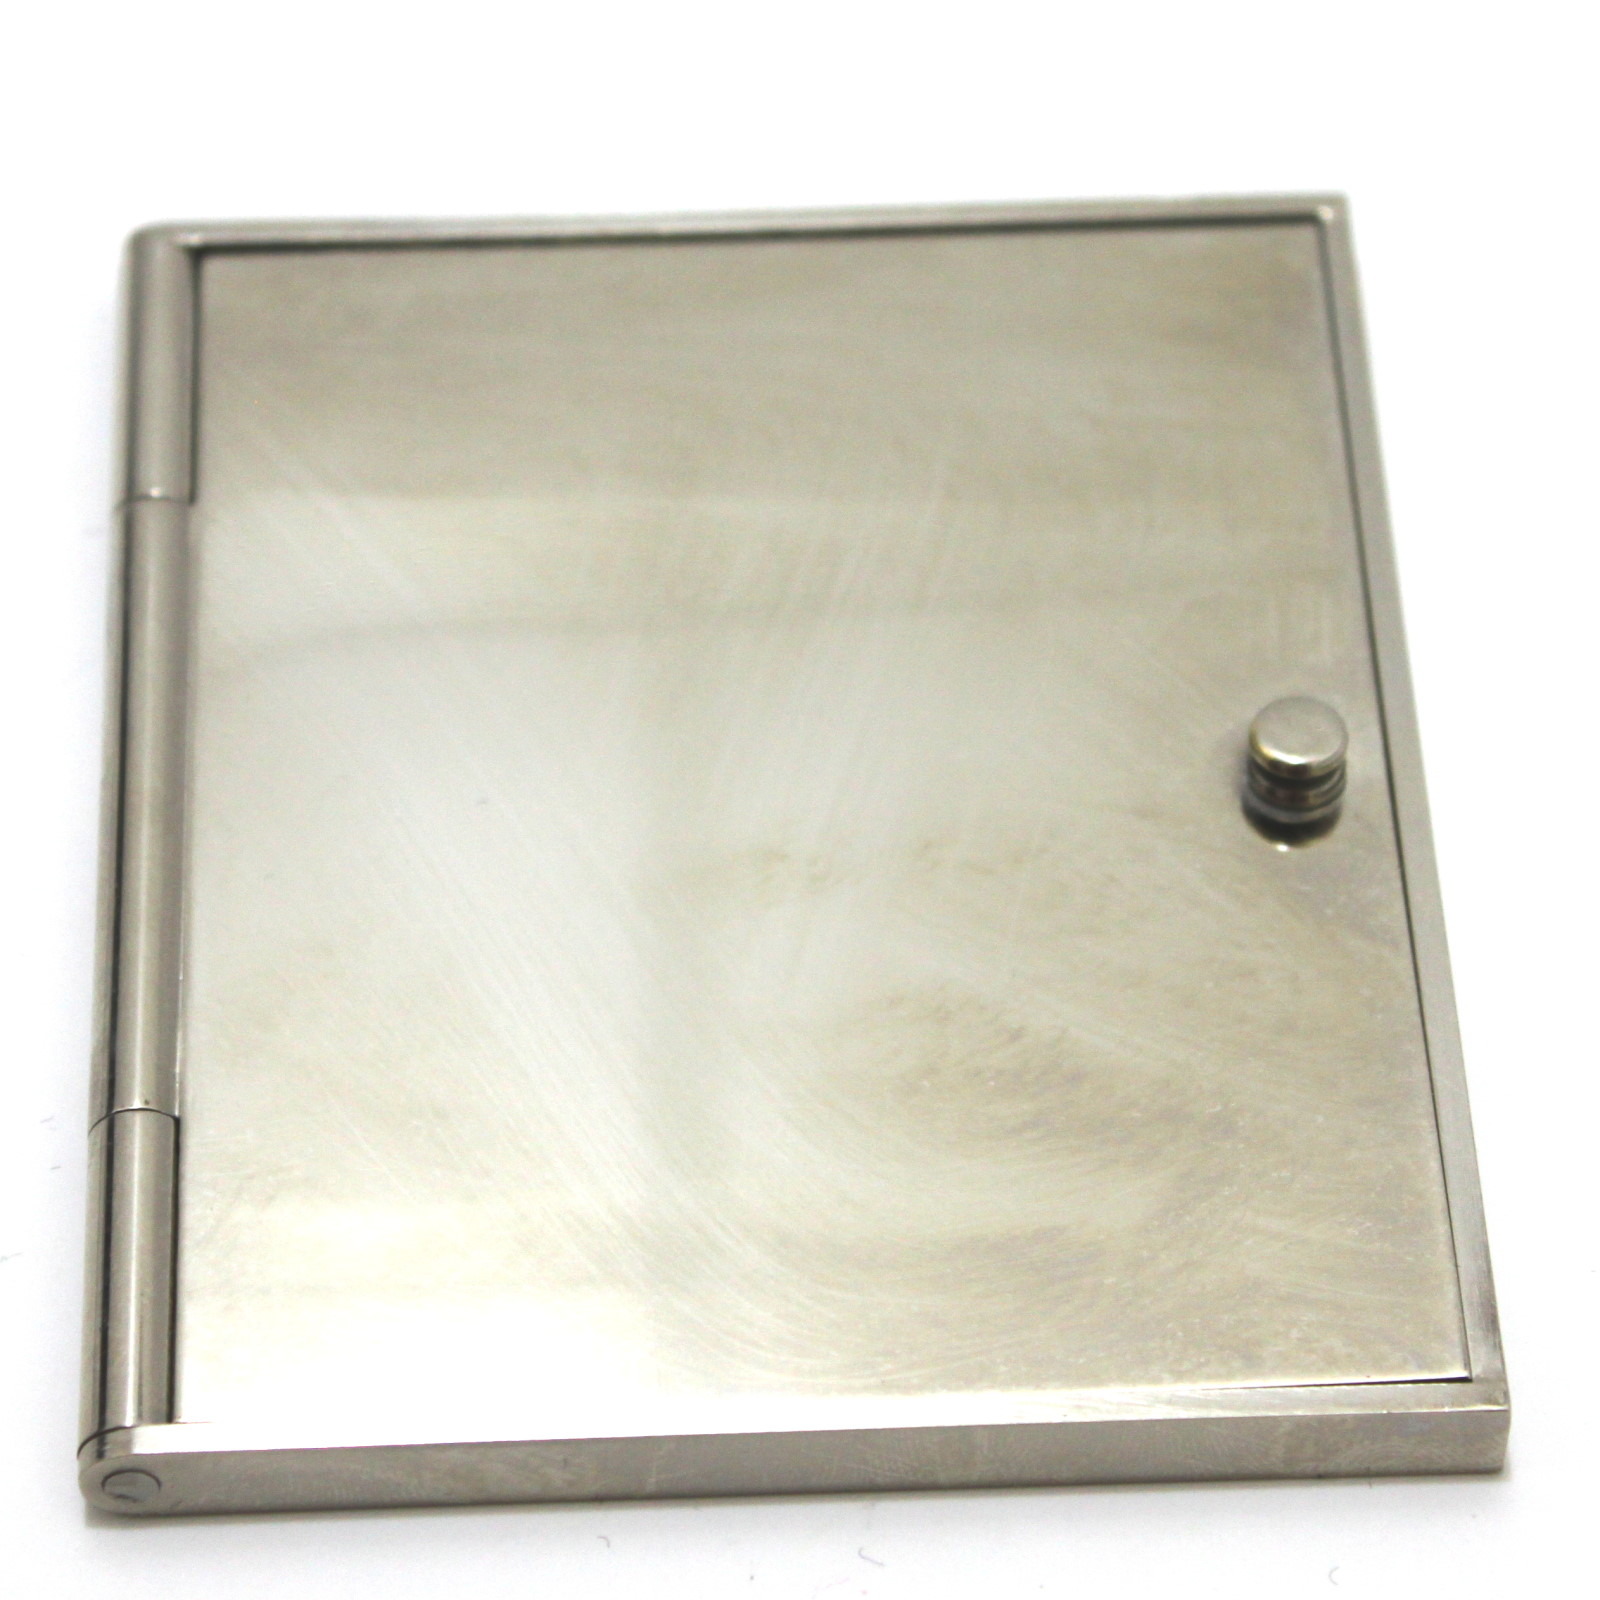 Thin Model Card Box by Viking Mfg.